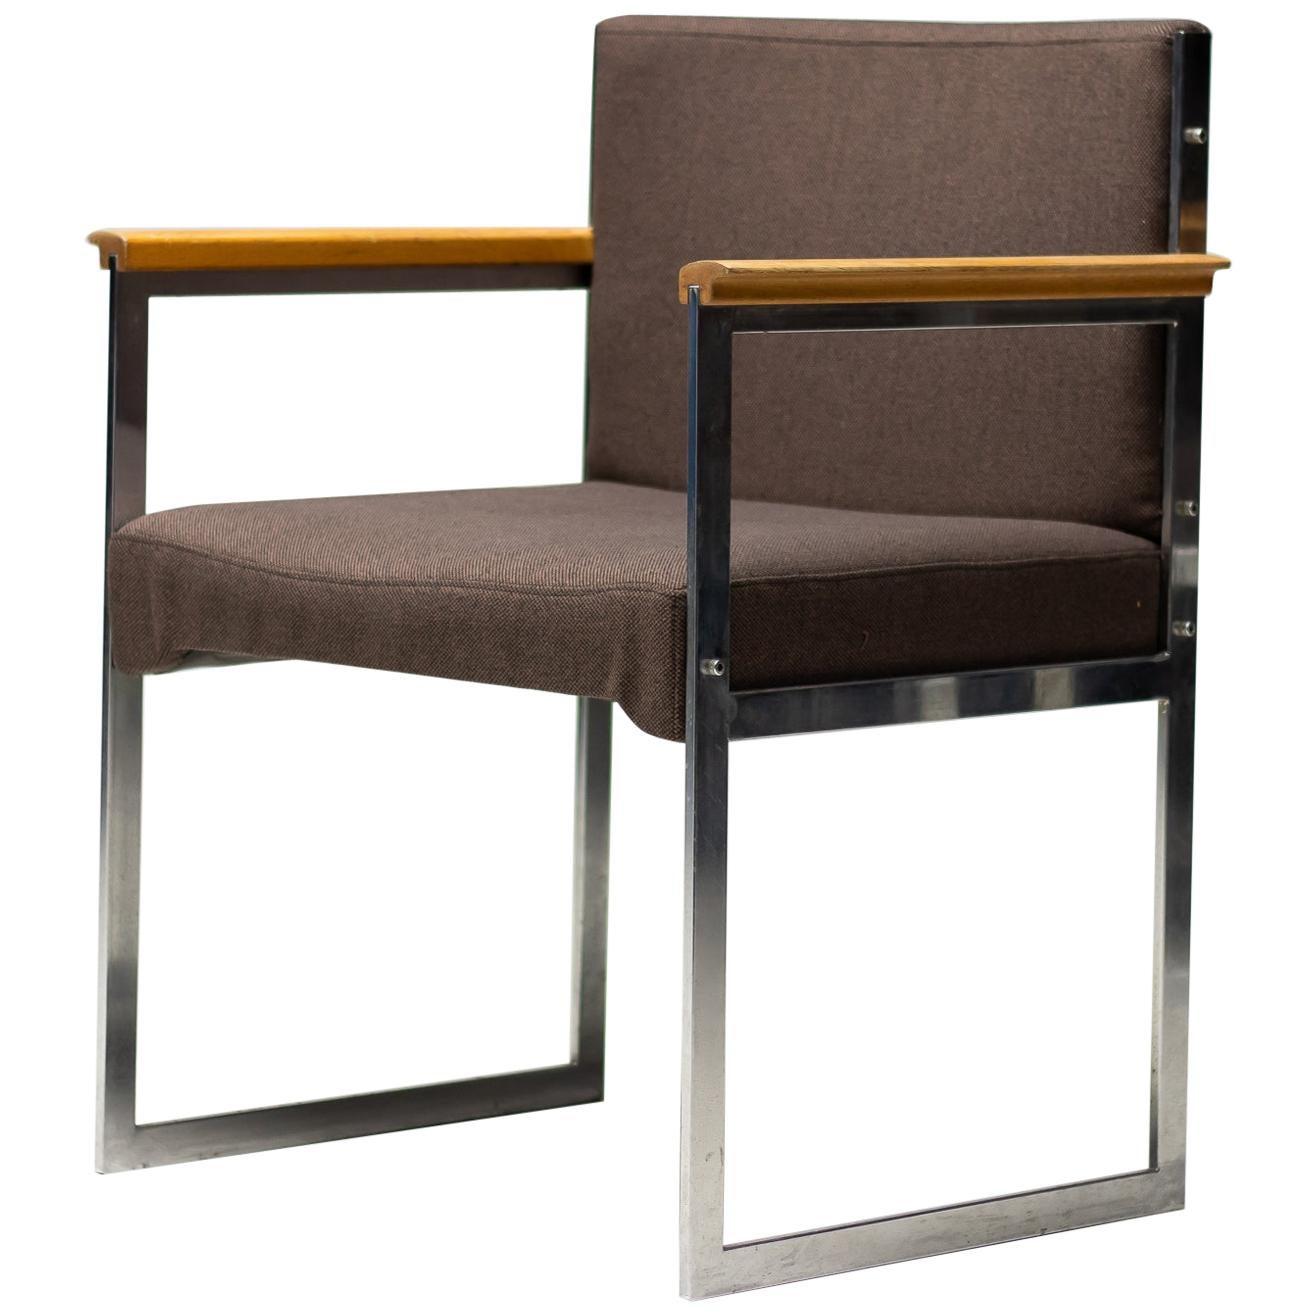 Five Armchairs by Illum Wikkelsø